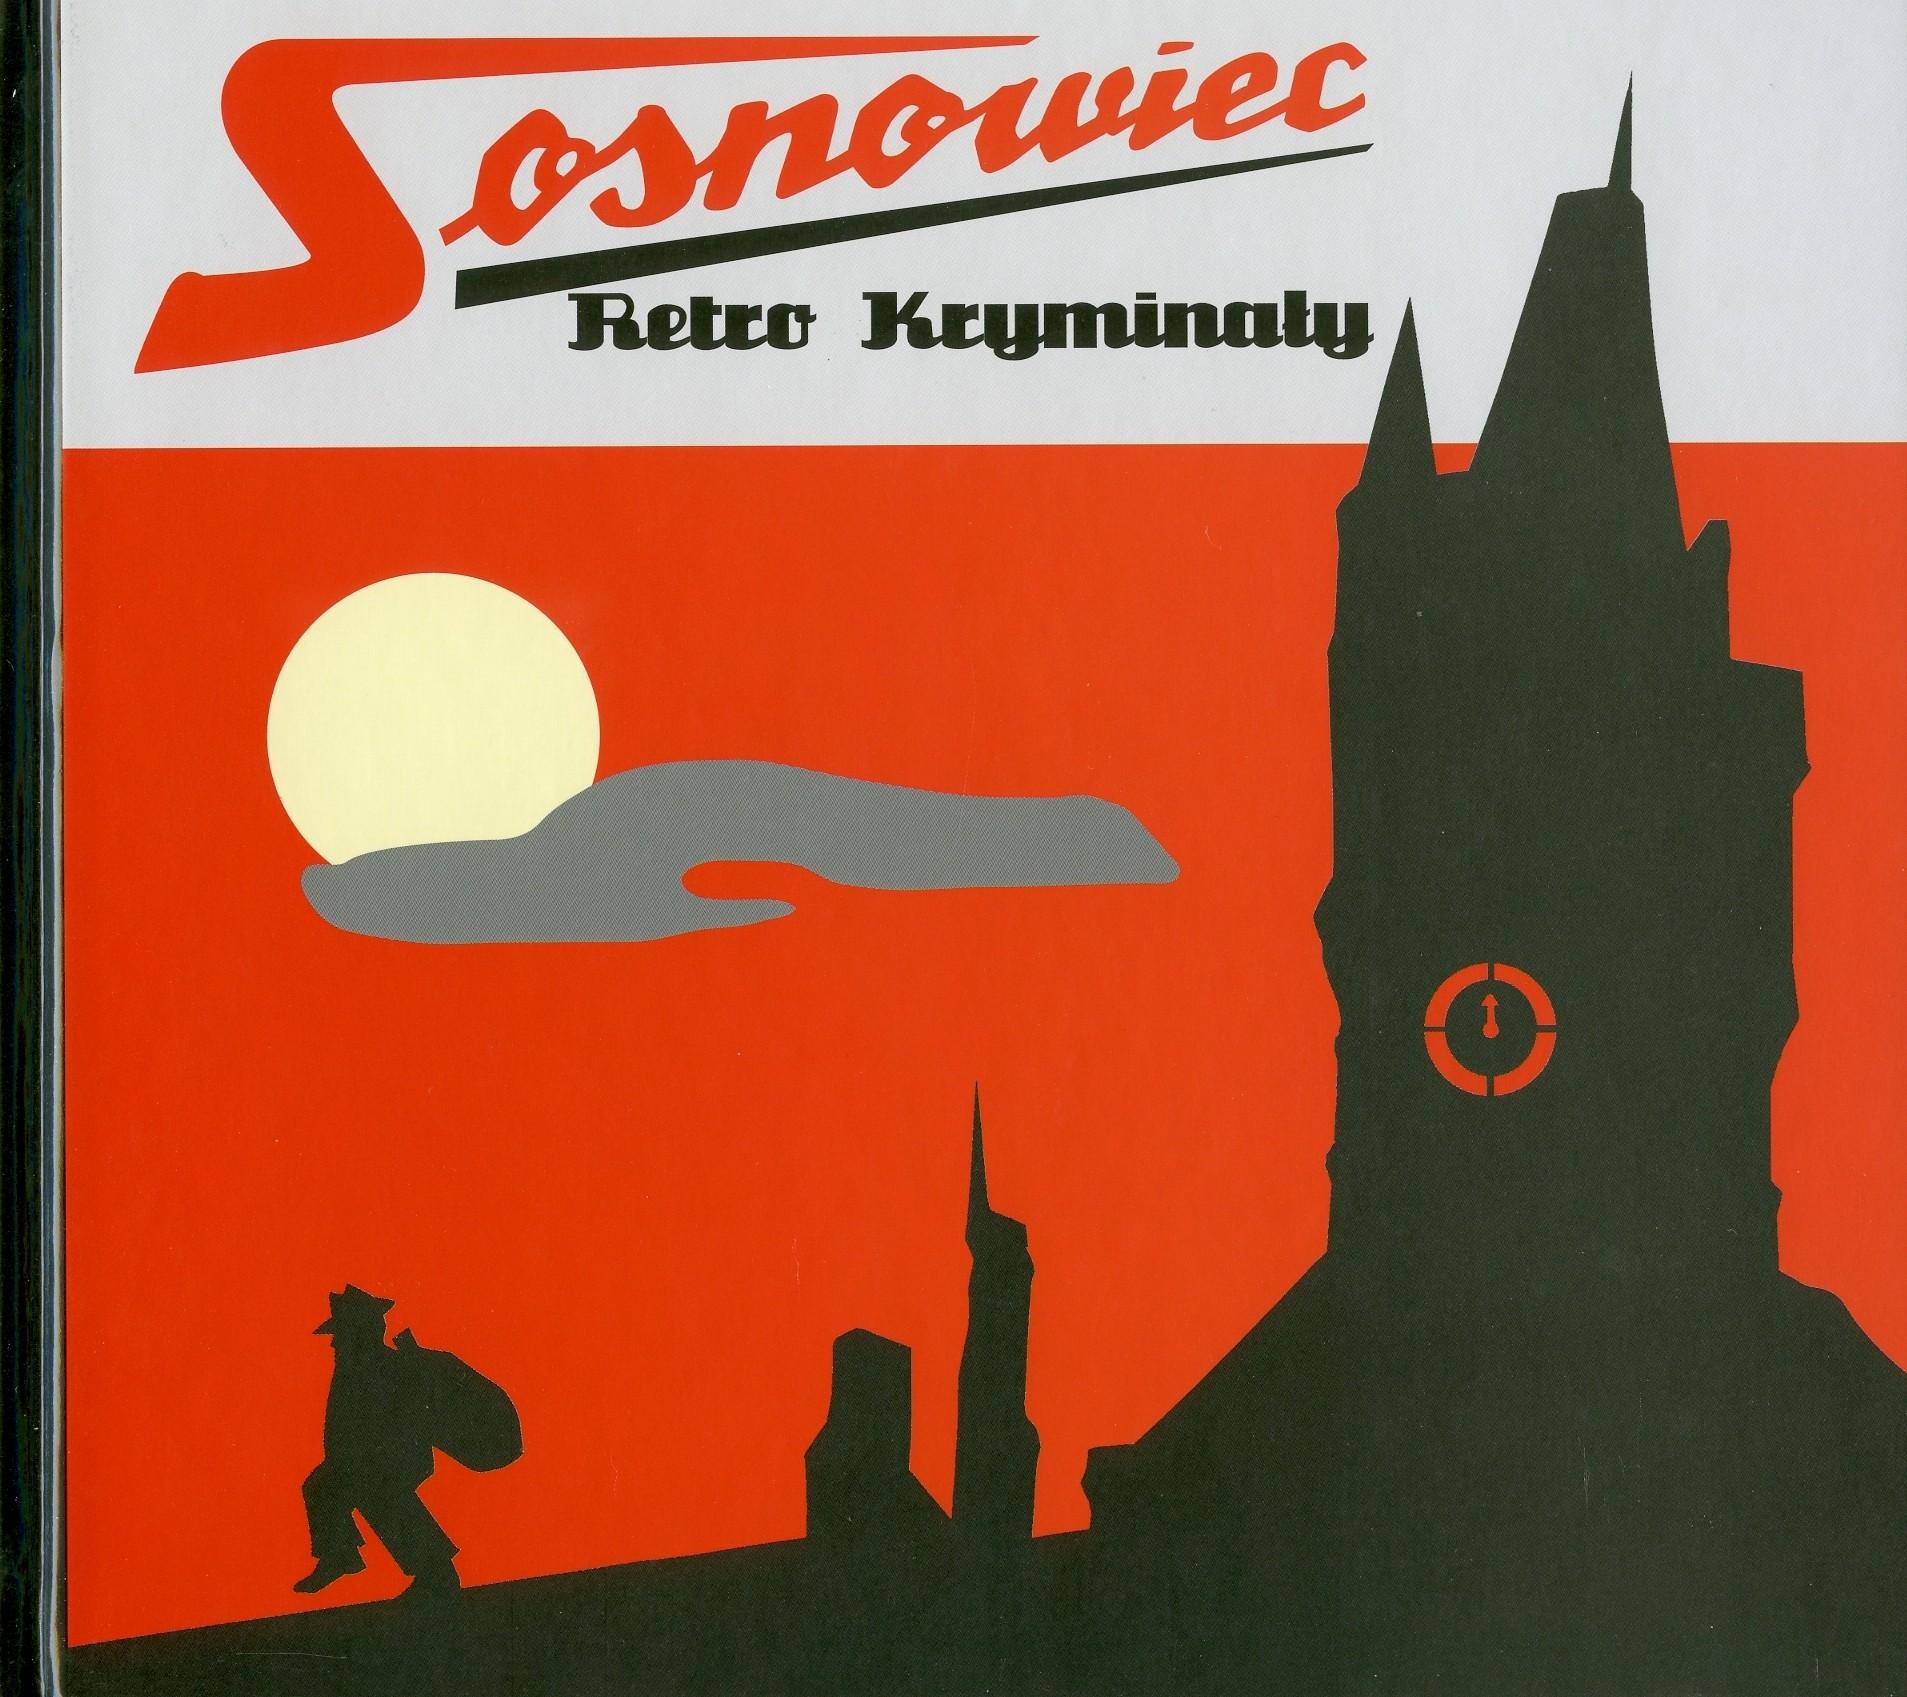 SOSNOWIEC Retro-Detektívi album Terek Dombrowski